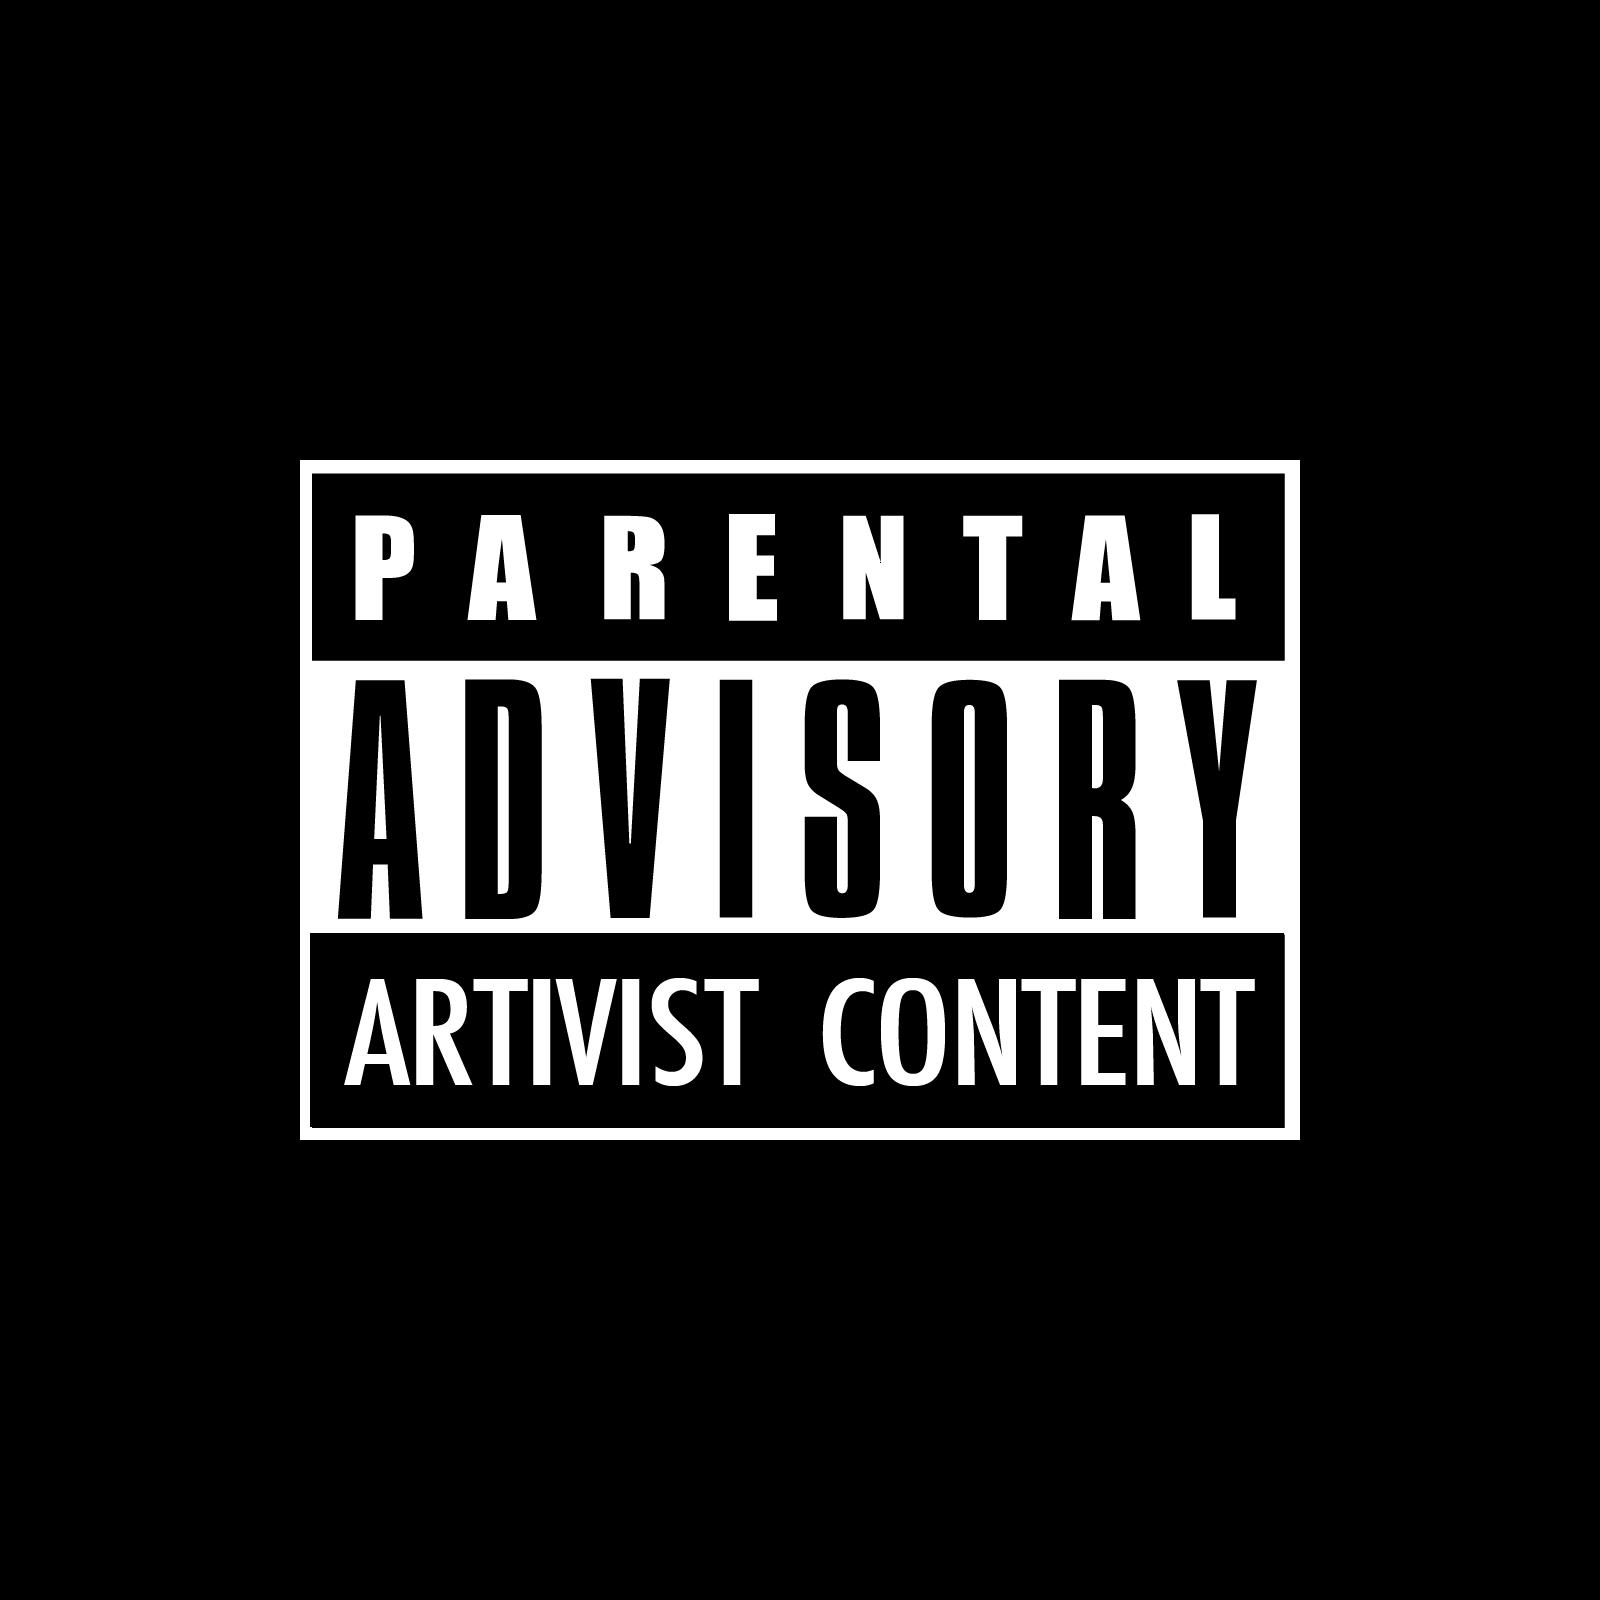 parental_advisory_explicit_content_lrgr_logo.png